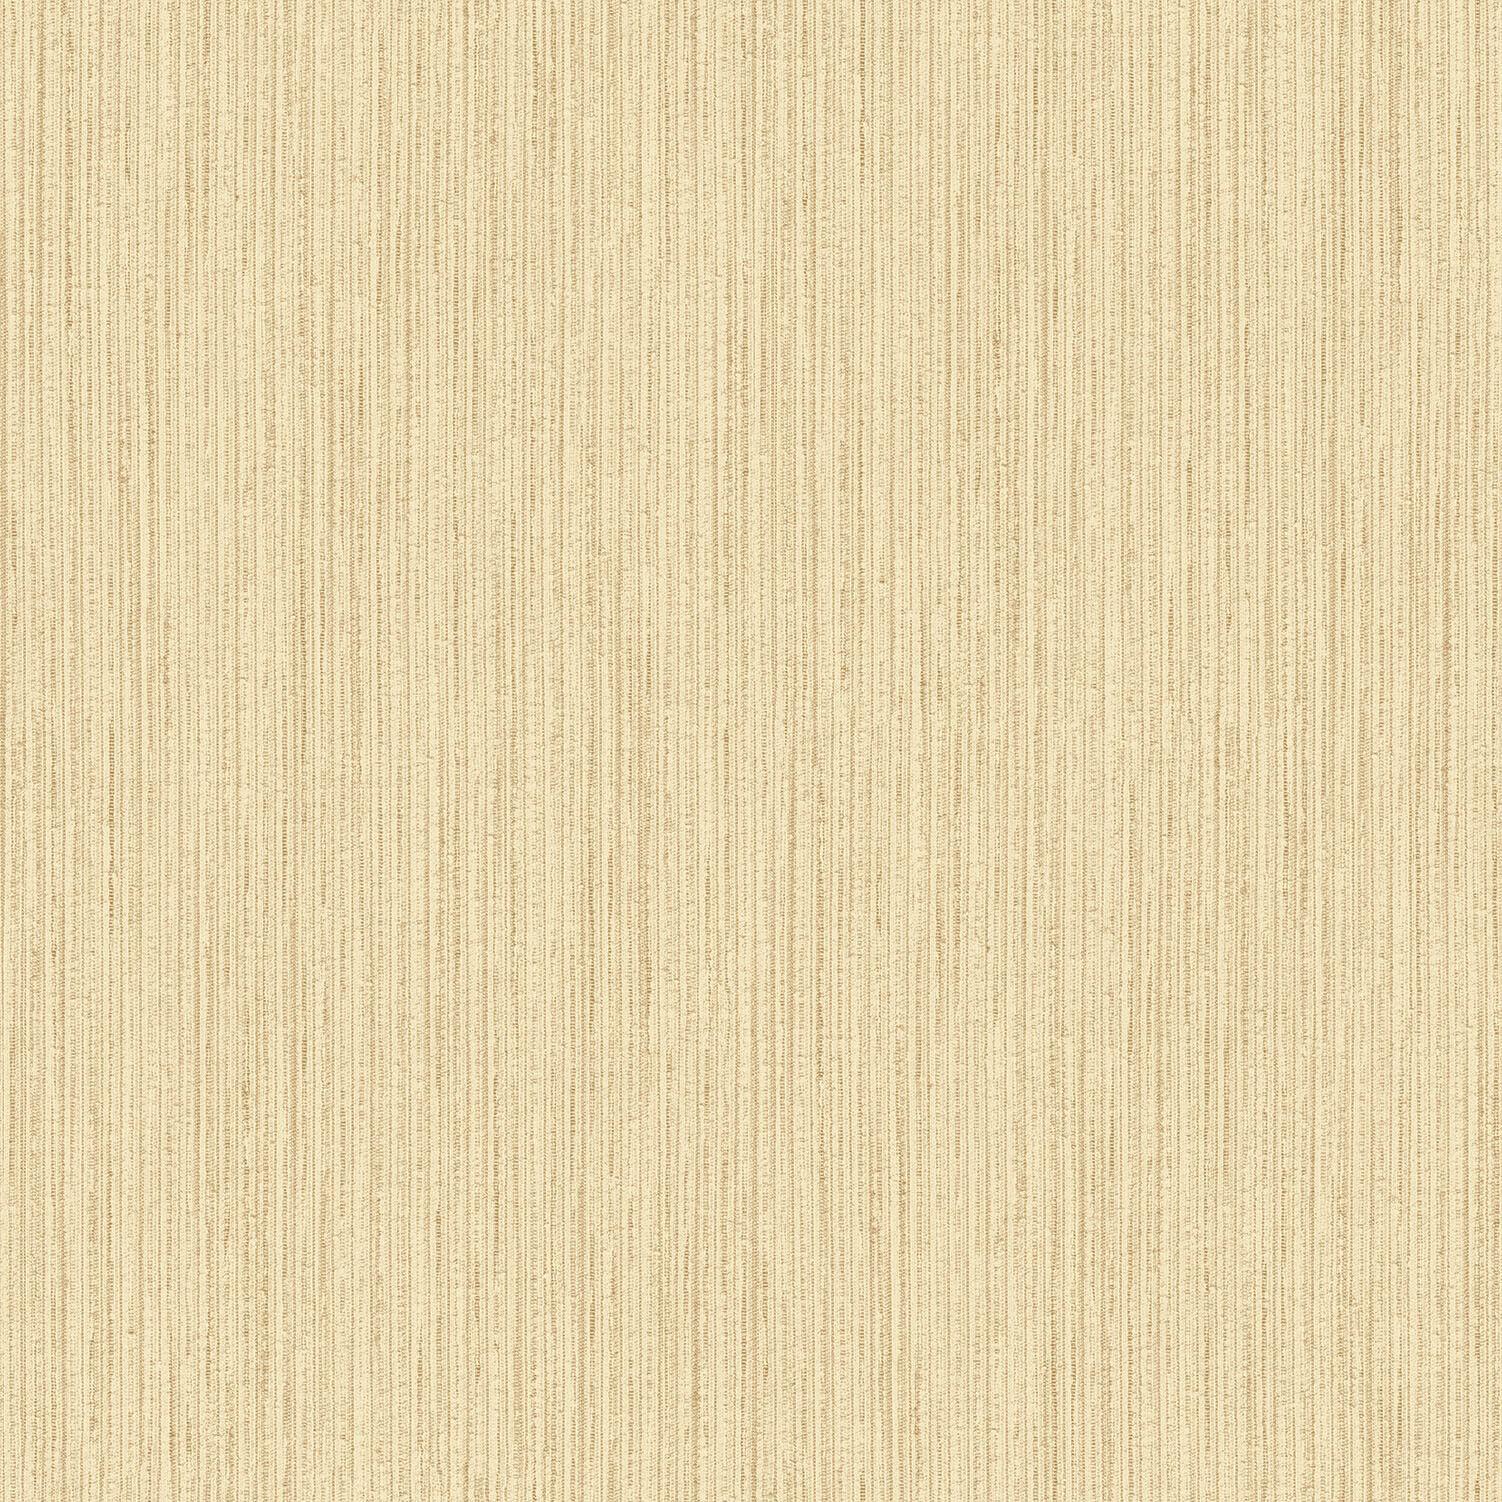 Essener Tapete Special Fx G67688 Stripes Striped Vinyl Fleece Wallpaper